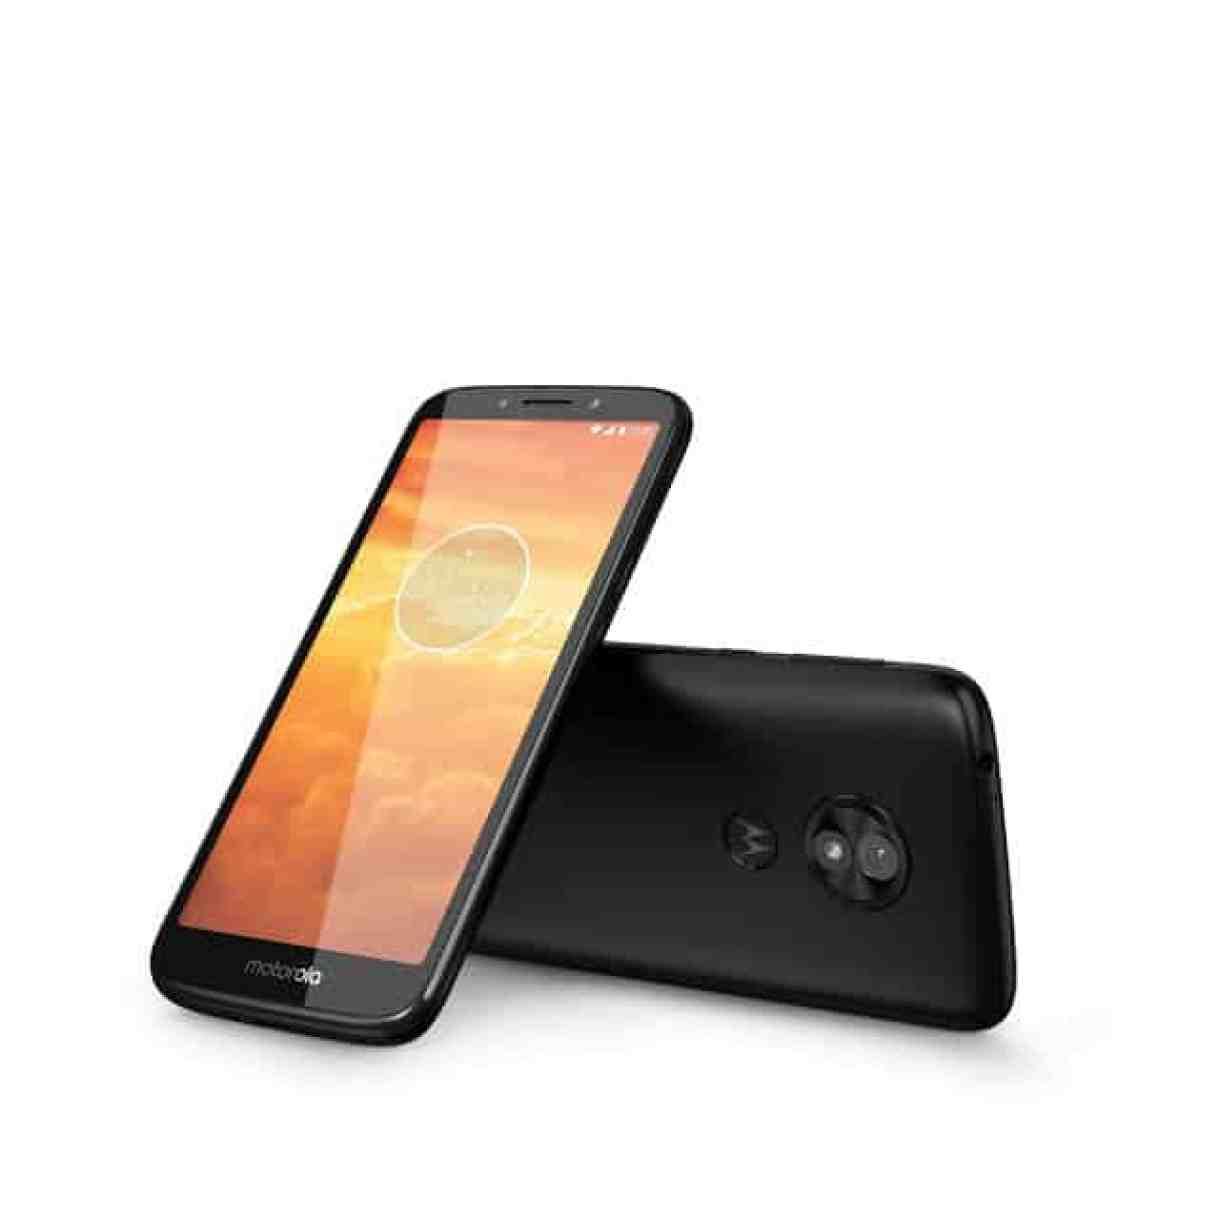 - MotoE5Play ROW Black LaydownCombo 1 - moto e5 play โทรศัพท์มือถือ Android Go จอใหญ่ มีสแกนลายนิ้วมือ ในราคาเพียง 2,888 บาท